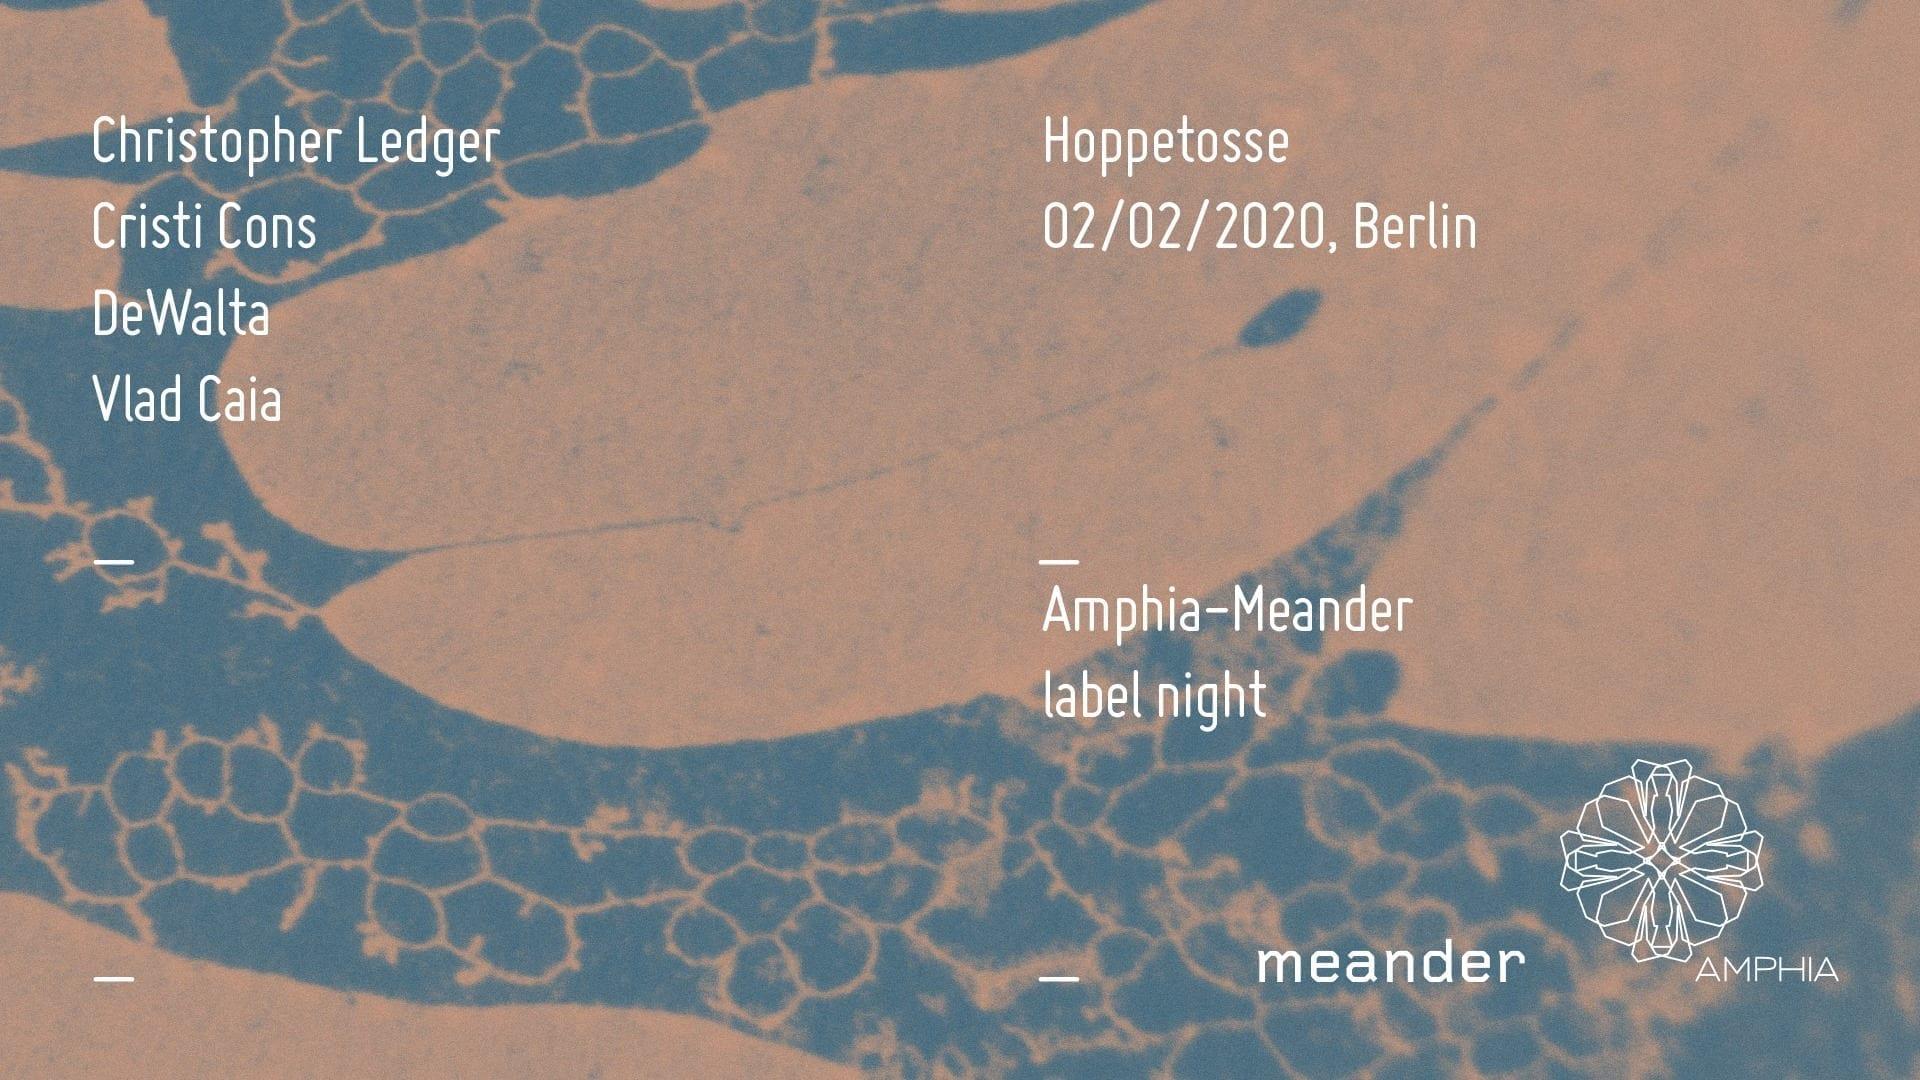 Amphia-Meander label night